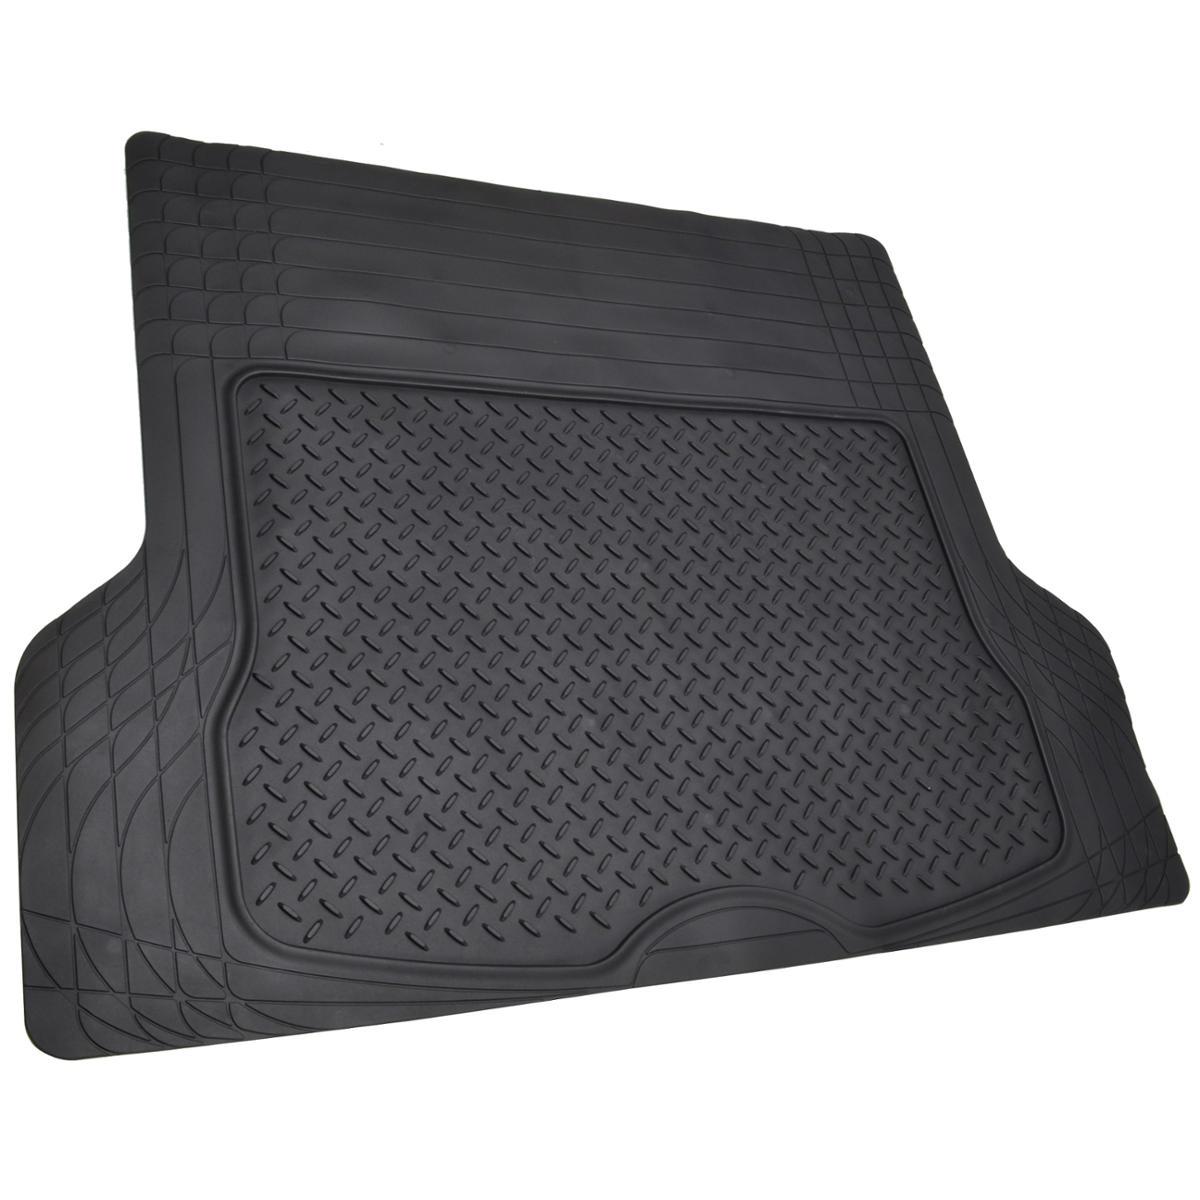 Cargo Trunk Floor Mat Liner for Car SUV Truck All Weather Semi Custom Fit Black   eBay